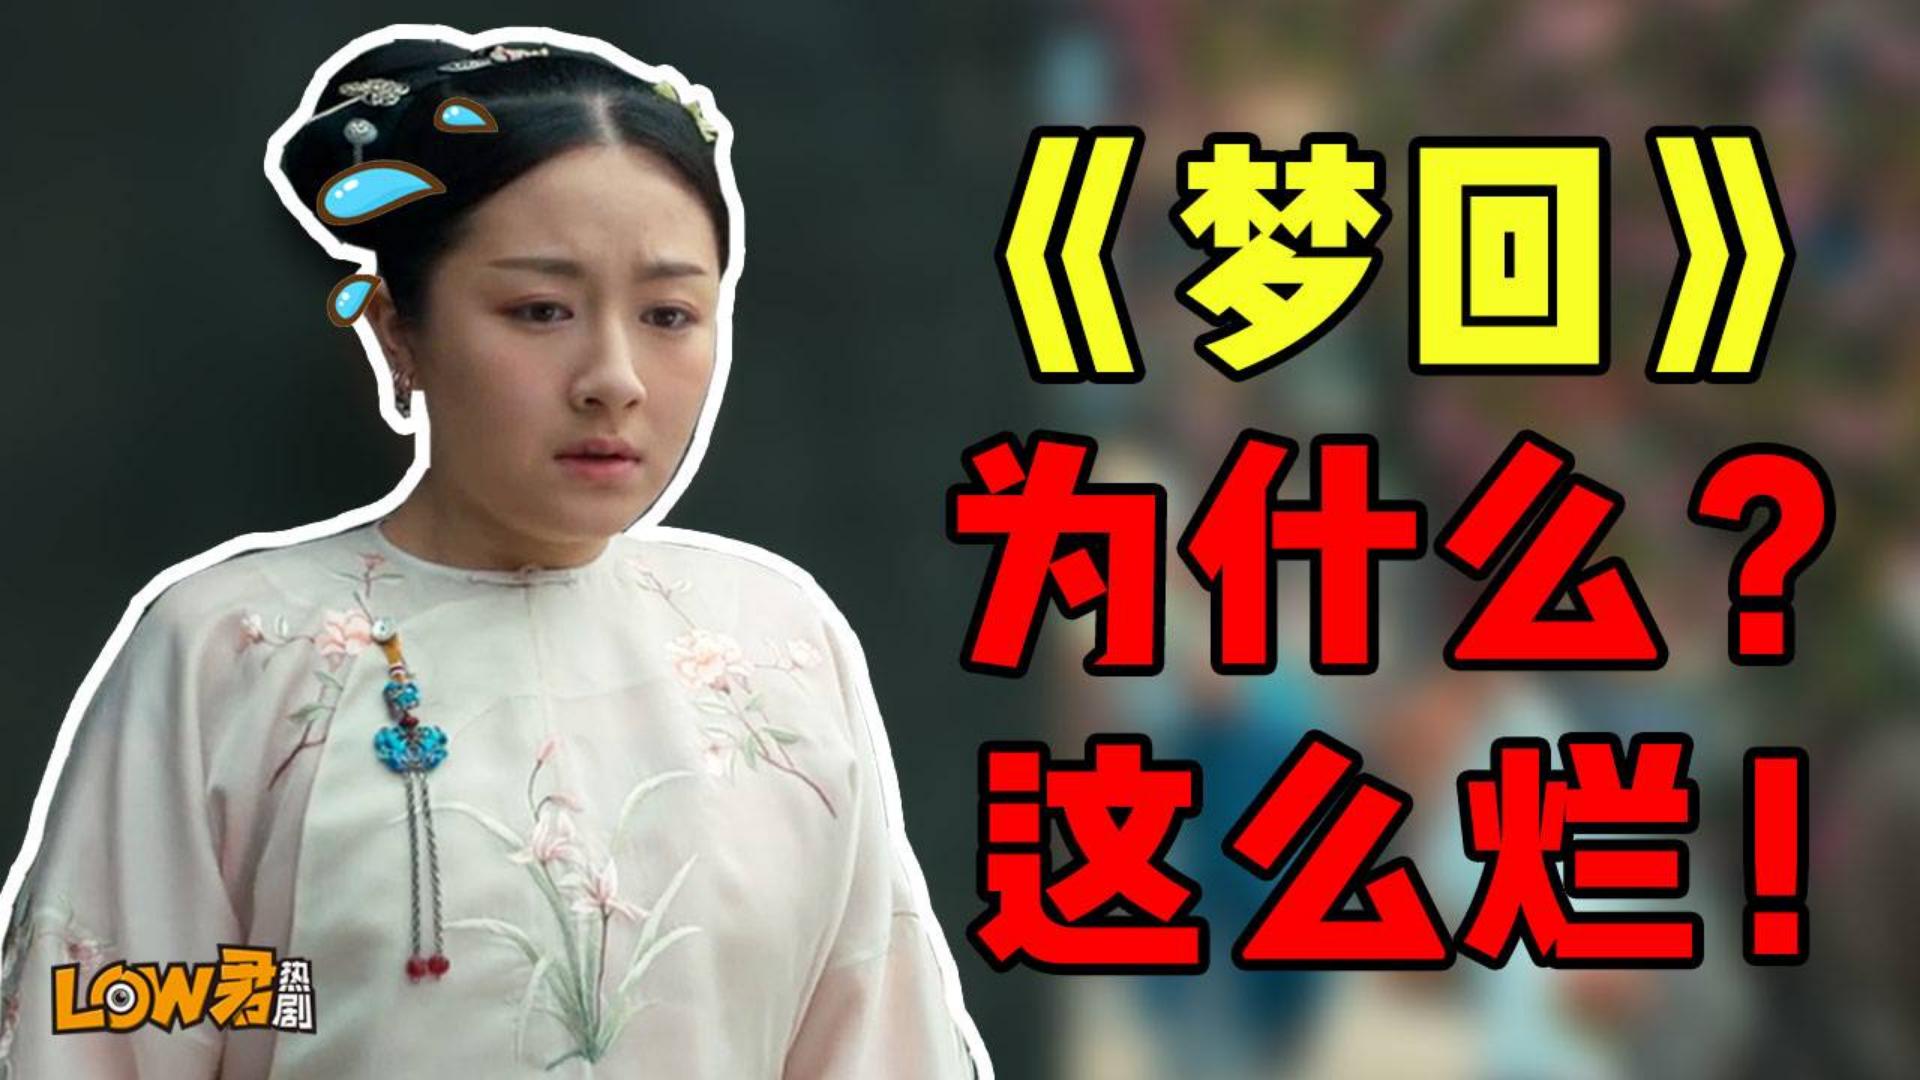 【low君】暴躁解析《梦回》为什么这么烂!!!